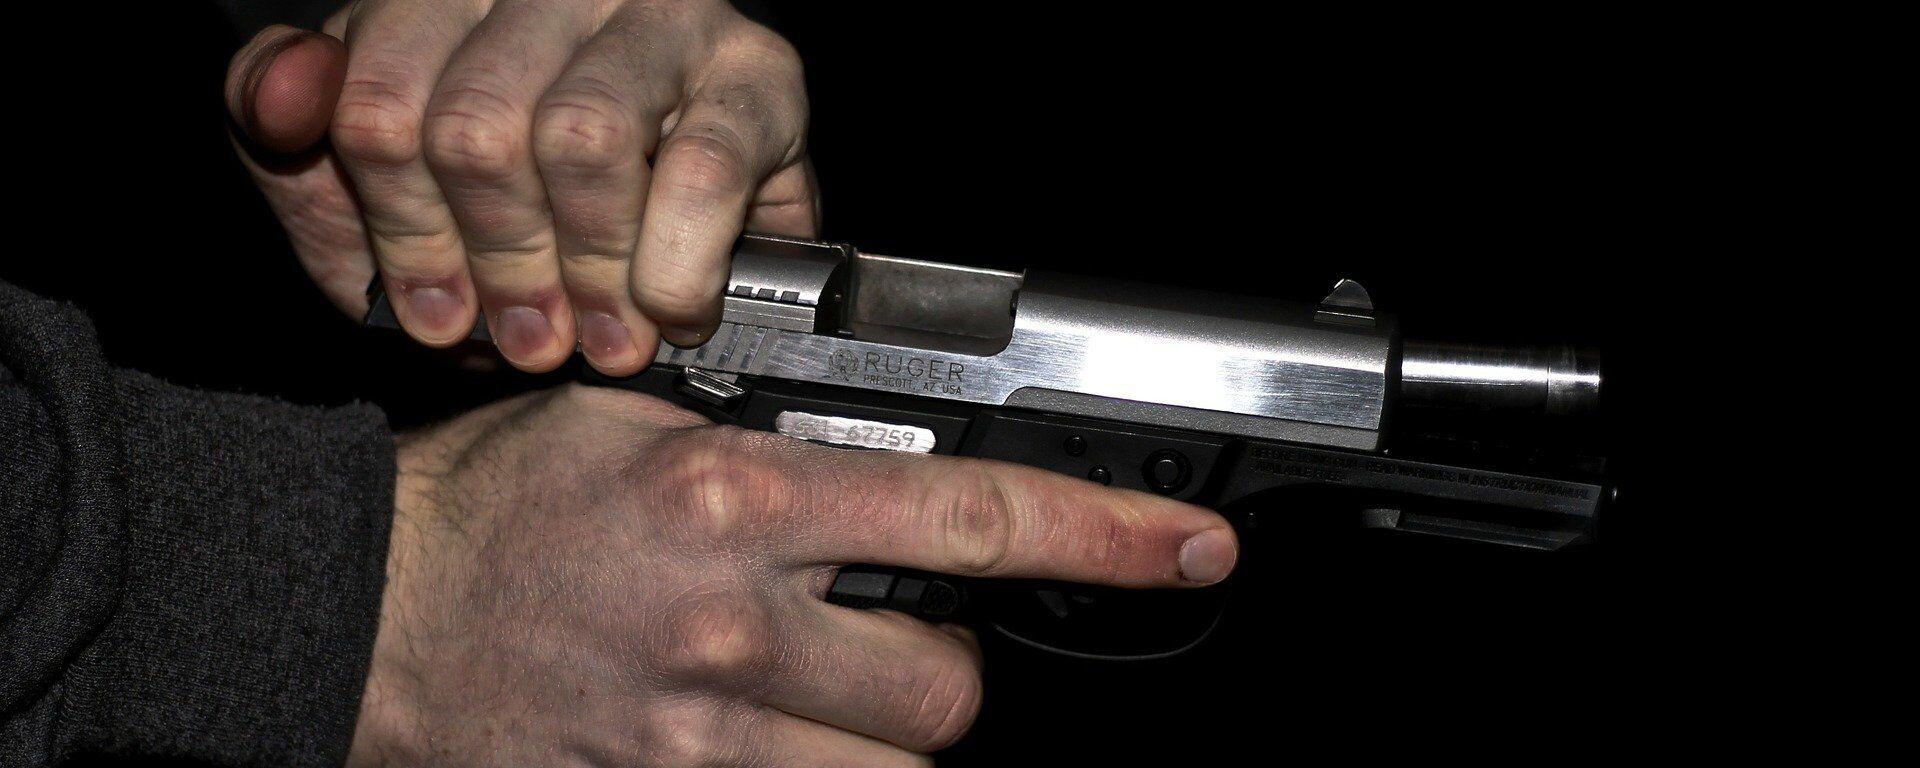 Una pistola (imagen referencial) - Sputnik Mundo, 1920, 27.08.2021